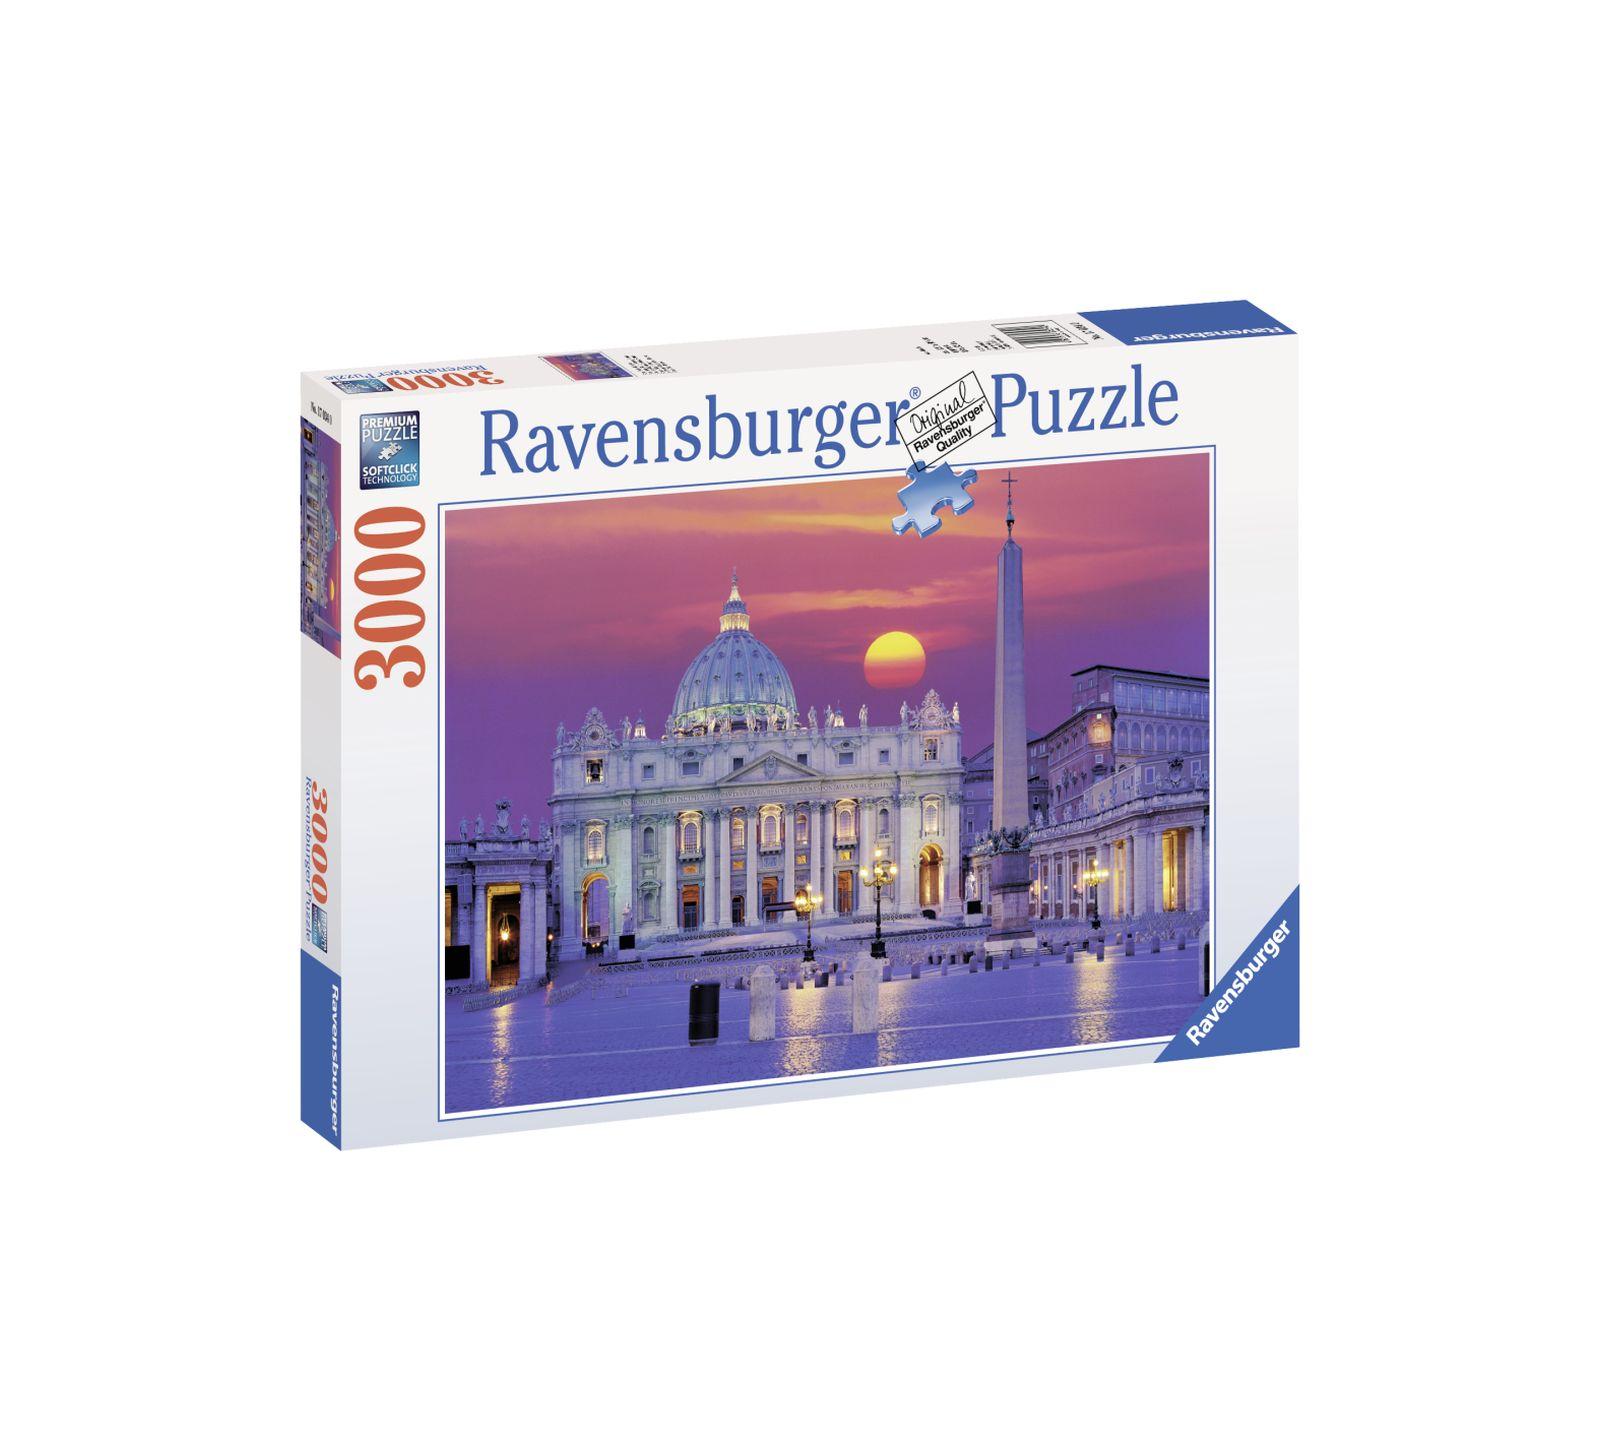 Ravensburger puzzle 3000 pezzi roma piazza san pietro - Ravensburger1